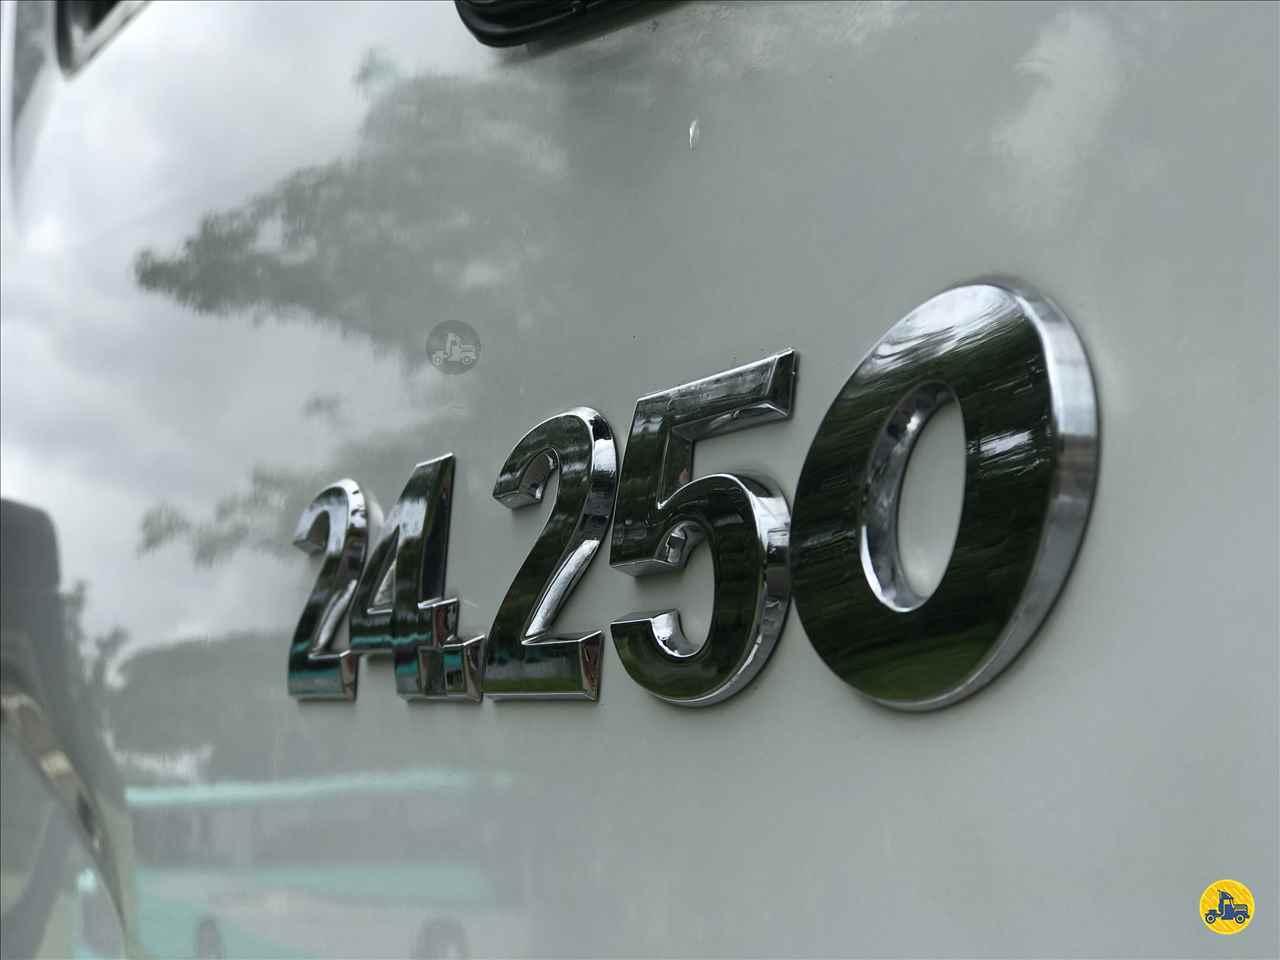 VOLKSWAGEN VW 24250 60000km 199/2010 Borges Caminhões